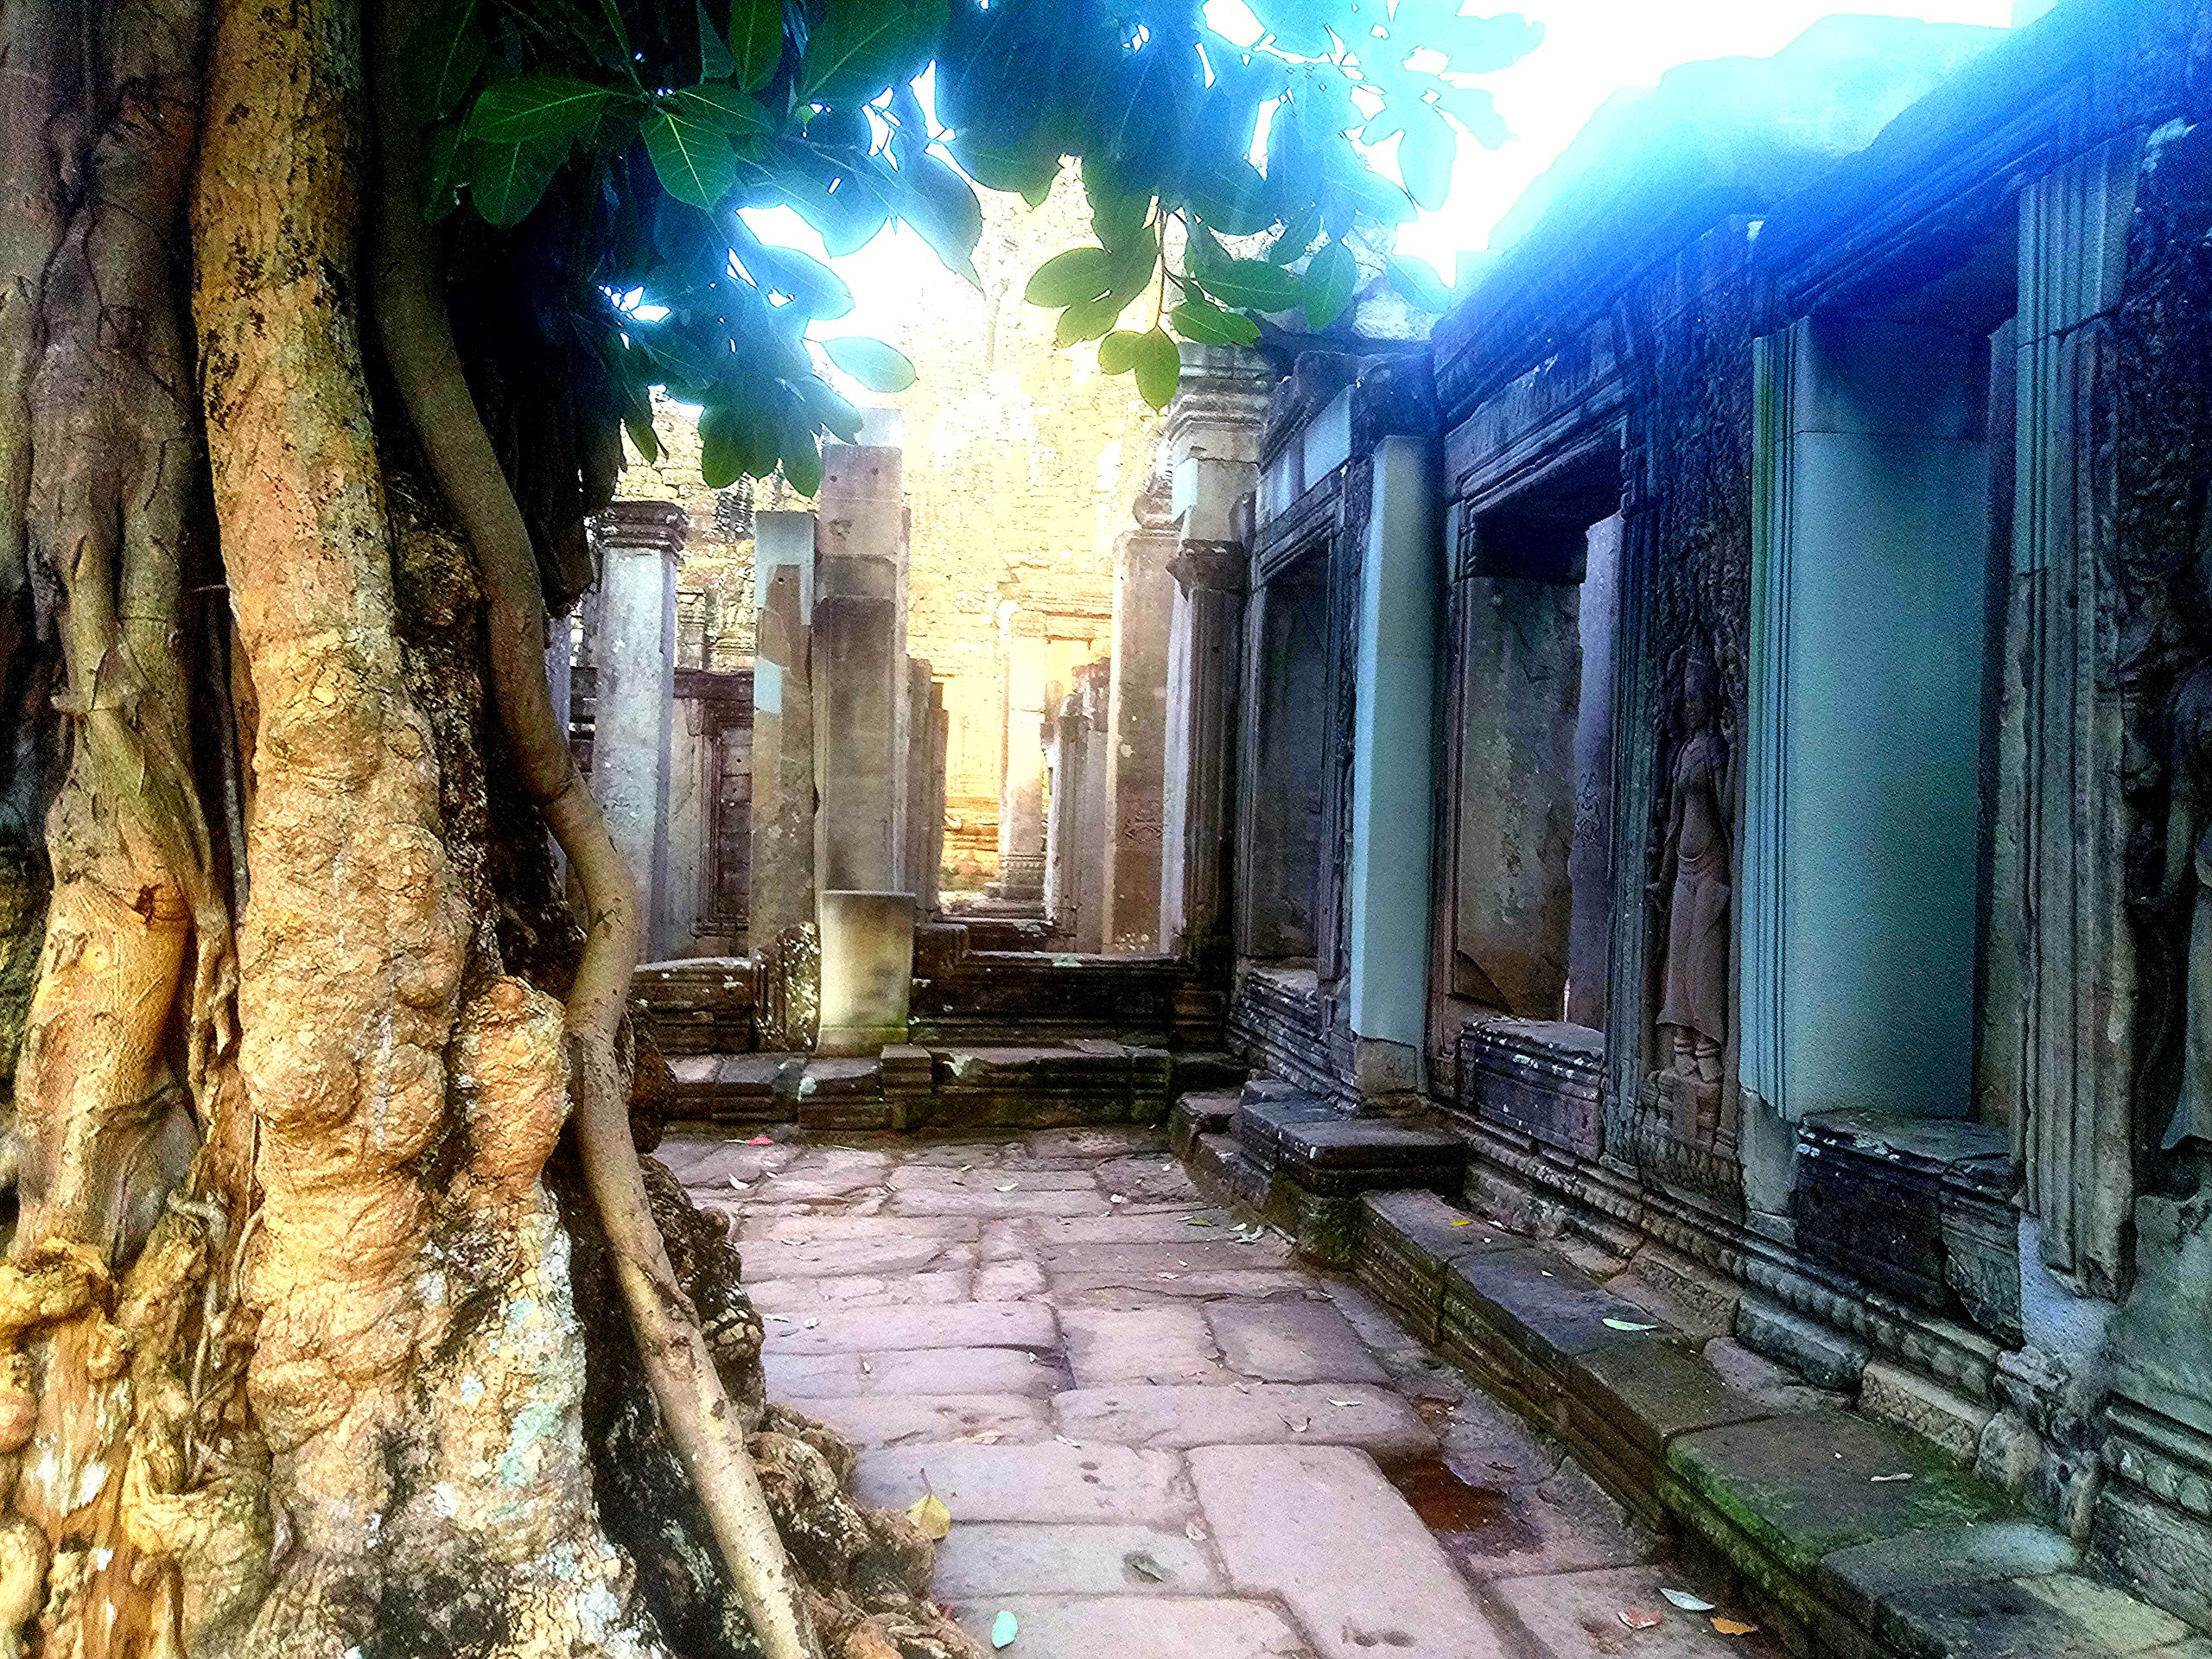 Елена Руденко (Валтея). Камбоджа. Ангкор. - Страница 2 Nrs3eN-d56I